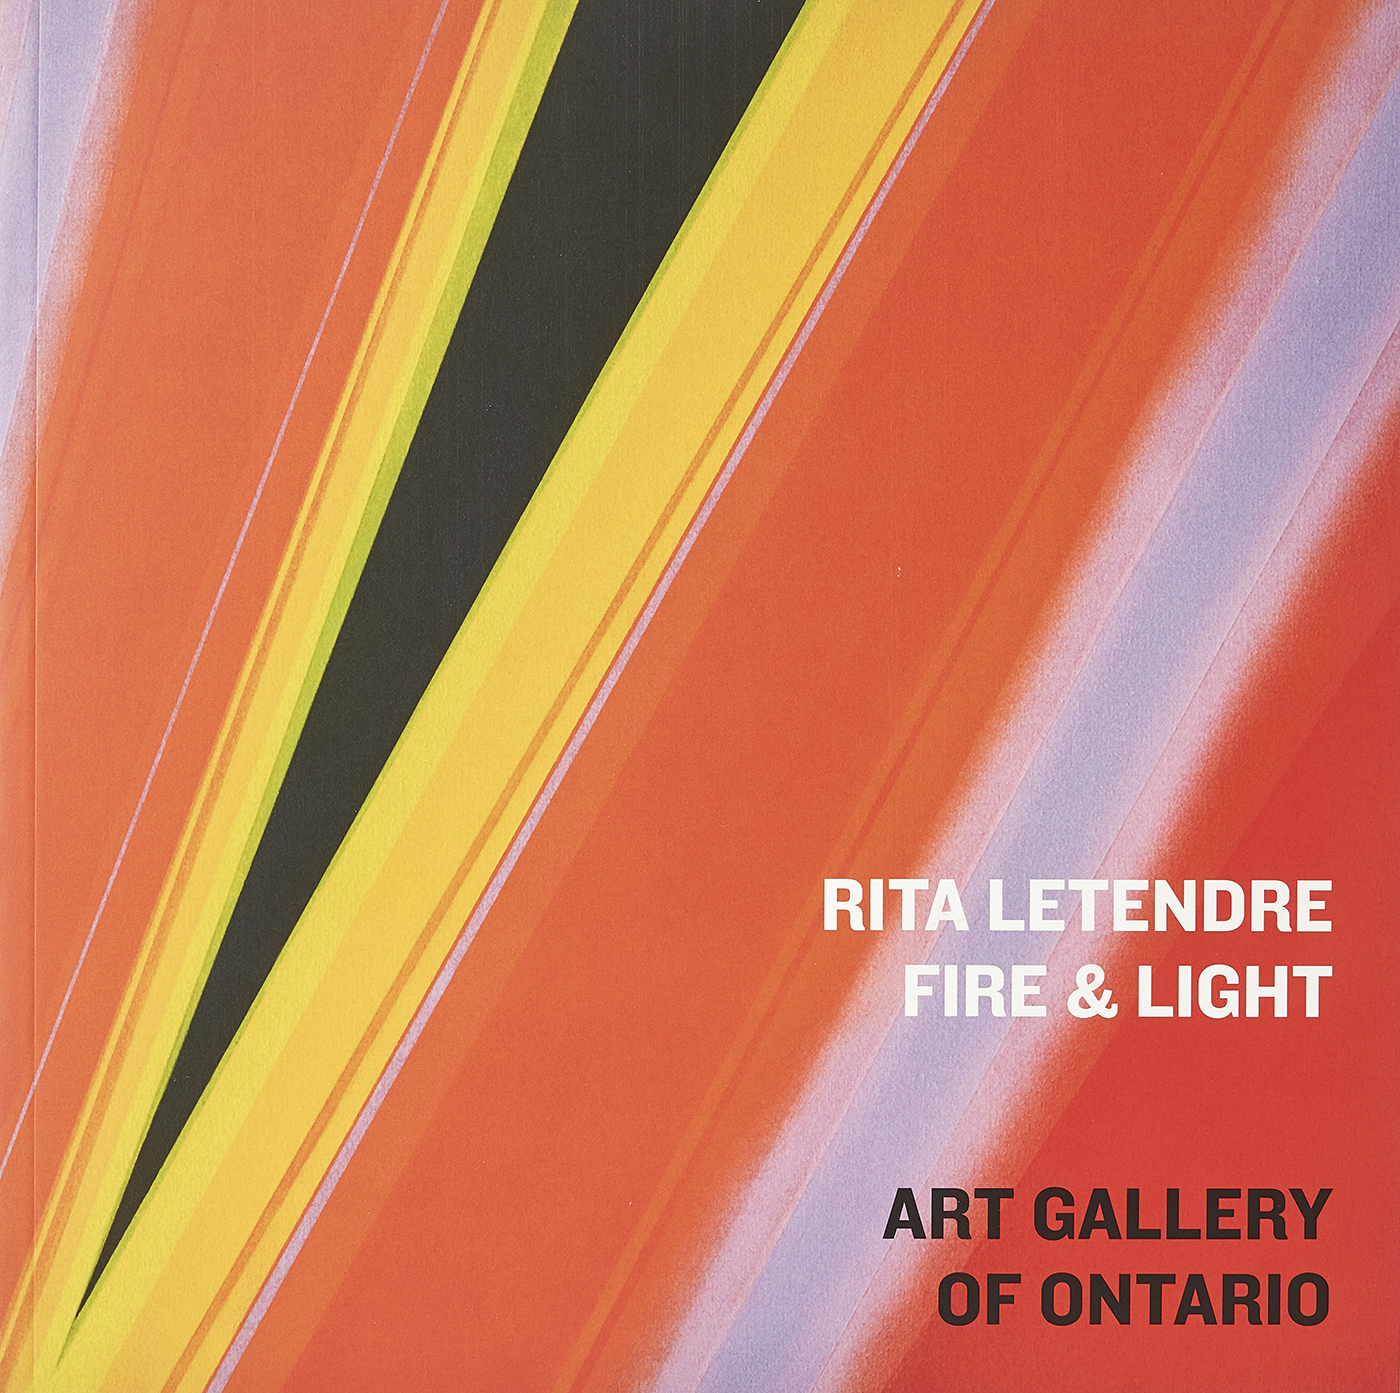 Rita Letendre